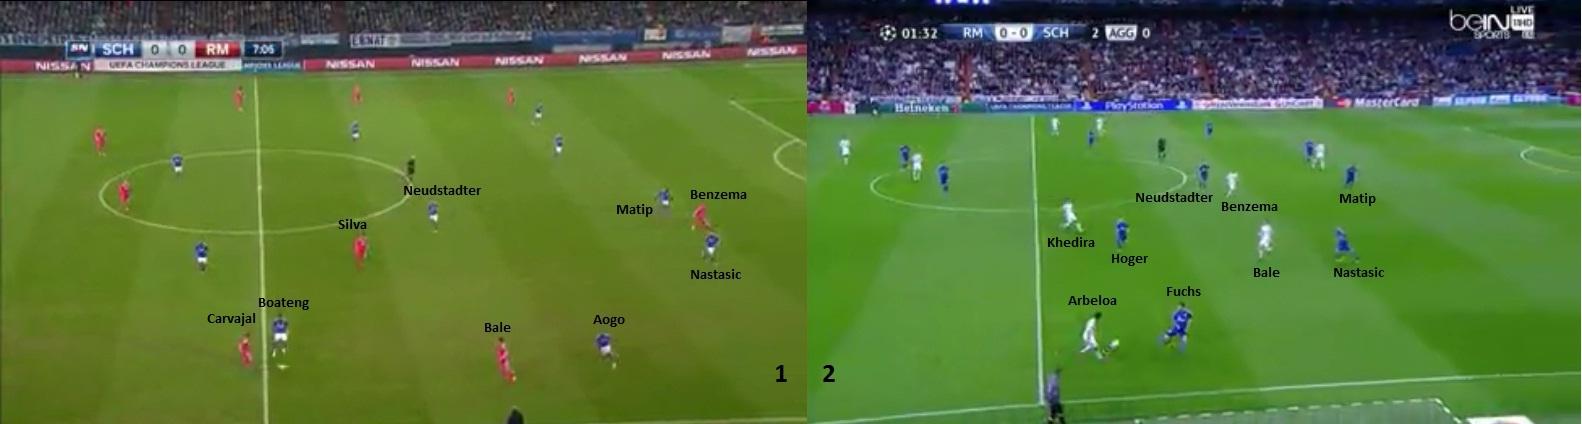 Perubahan skema bertahan Schalke, leg pertama (kiri) dan leg kedua (kanan).